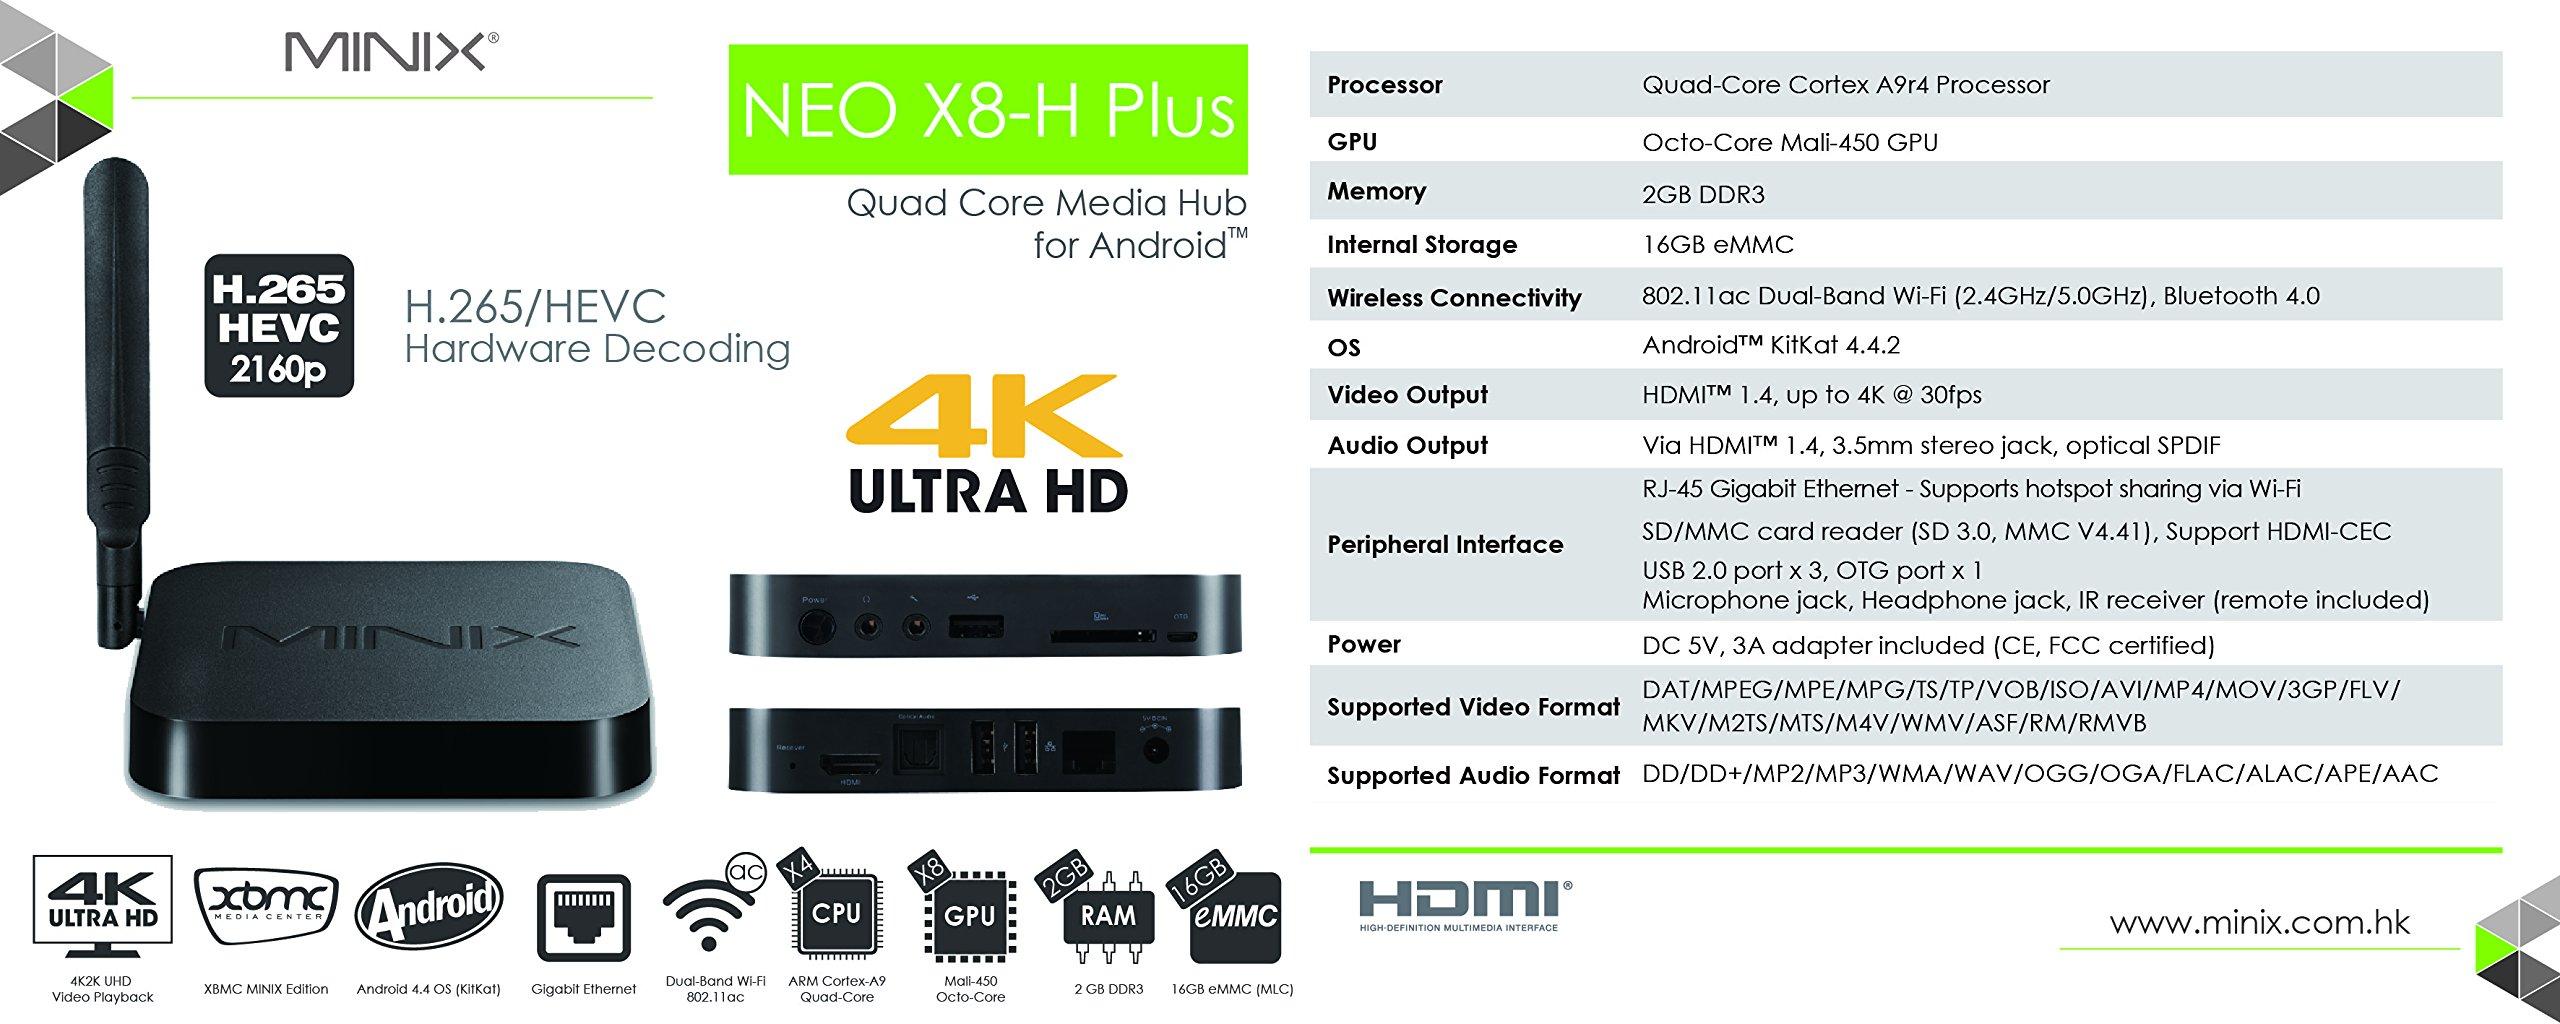 MINIX X8-H Plus Smart TV Box Mini PC & Media Streaming Player Amlogic S812-H Quad-Core Cortex-A9 Processor up to 2.0GHz Android 4.4.2 Full 2160p H.265/HEVC HDMI 2G/16G Hardware Recording by Jesurun (Image #6)